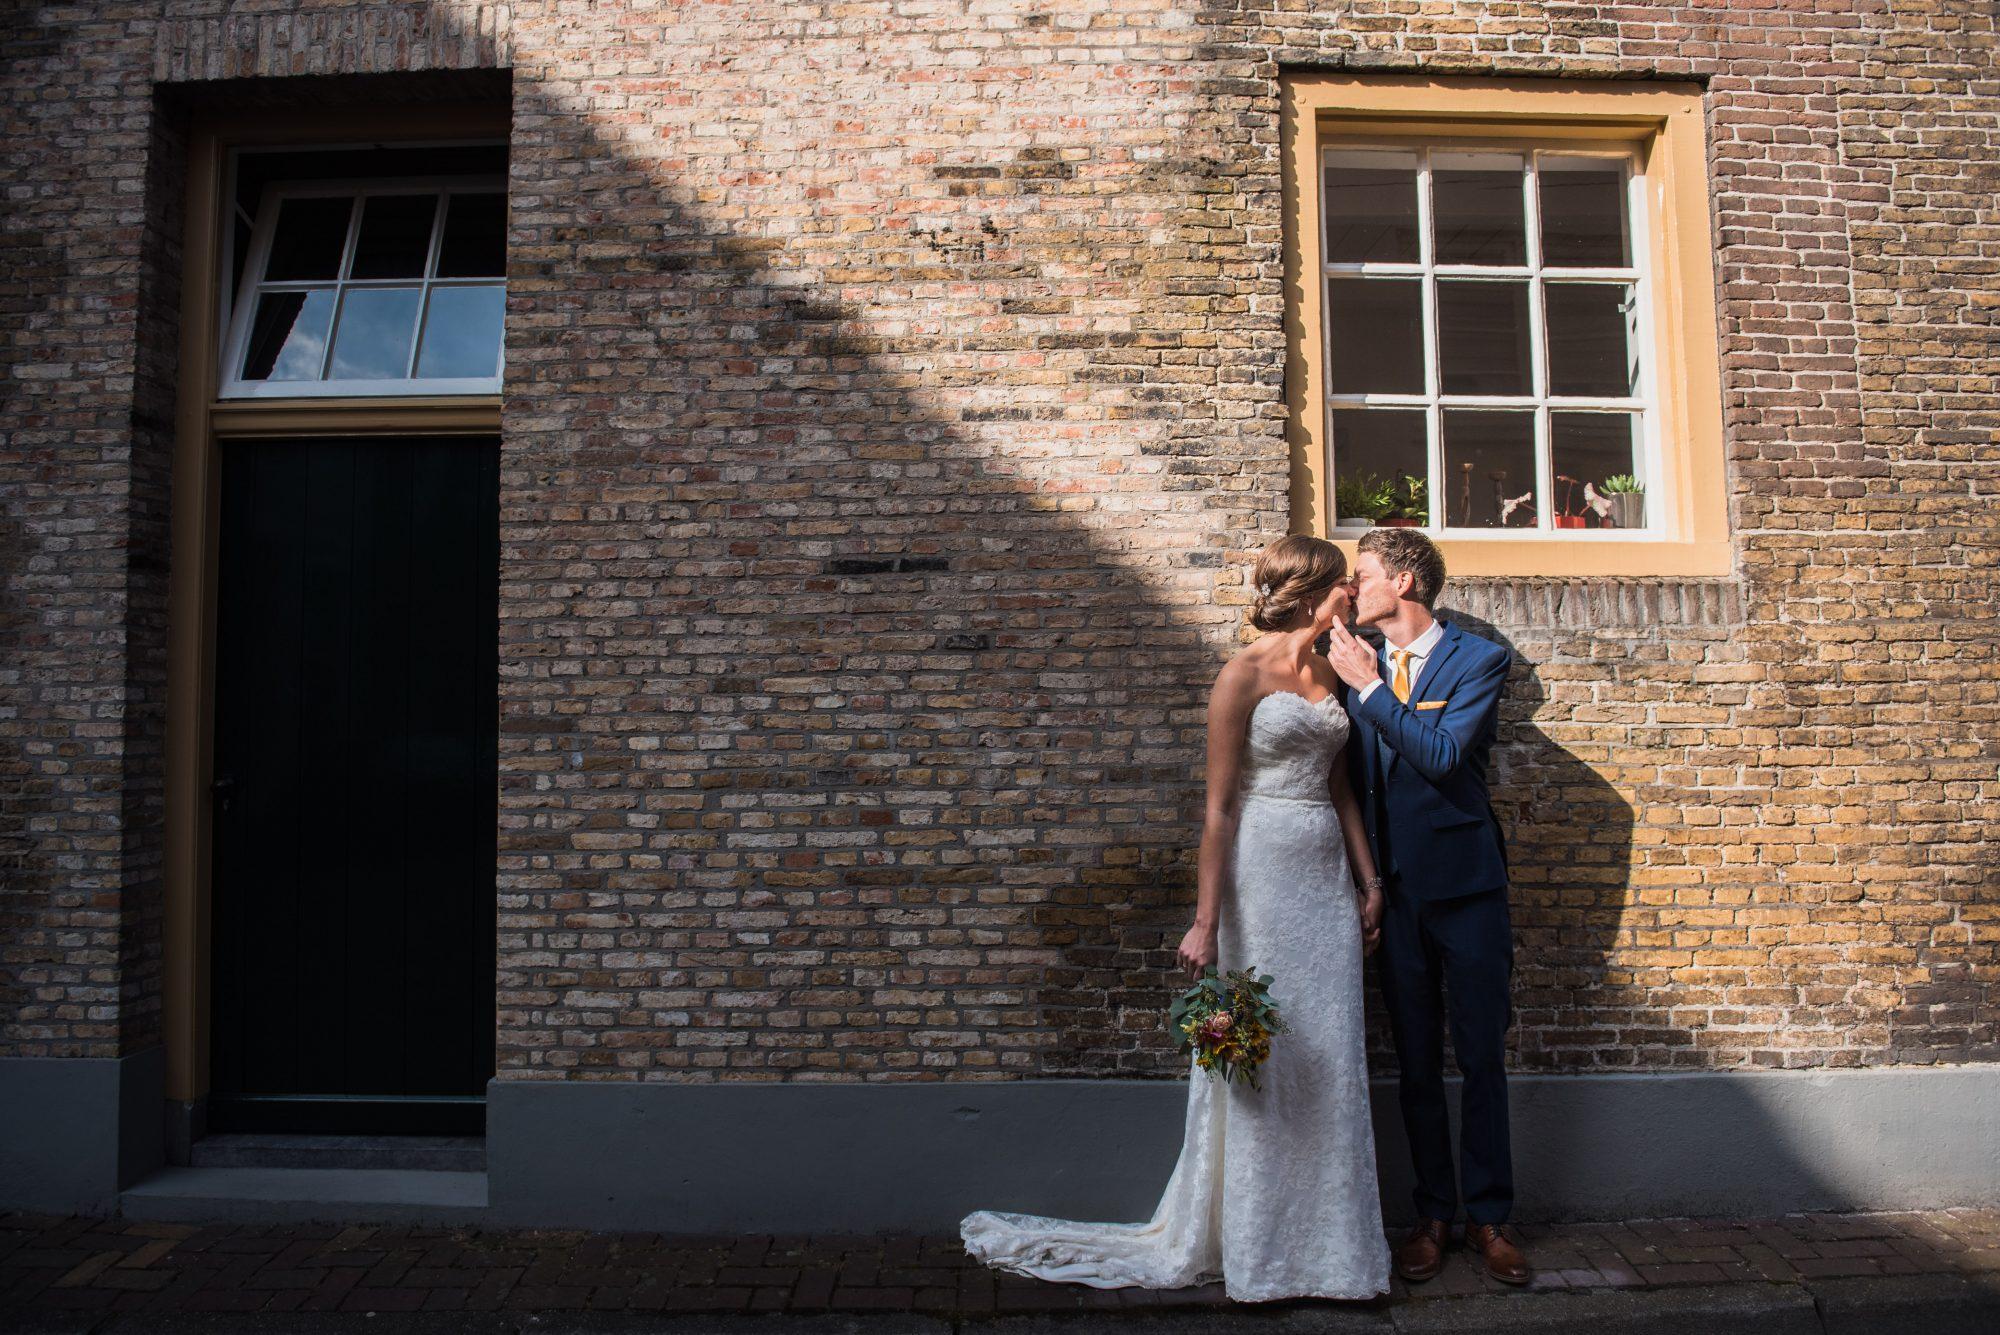 bruiloft-roland-annewil-232